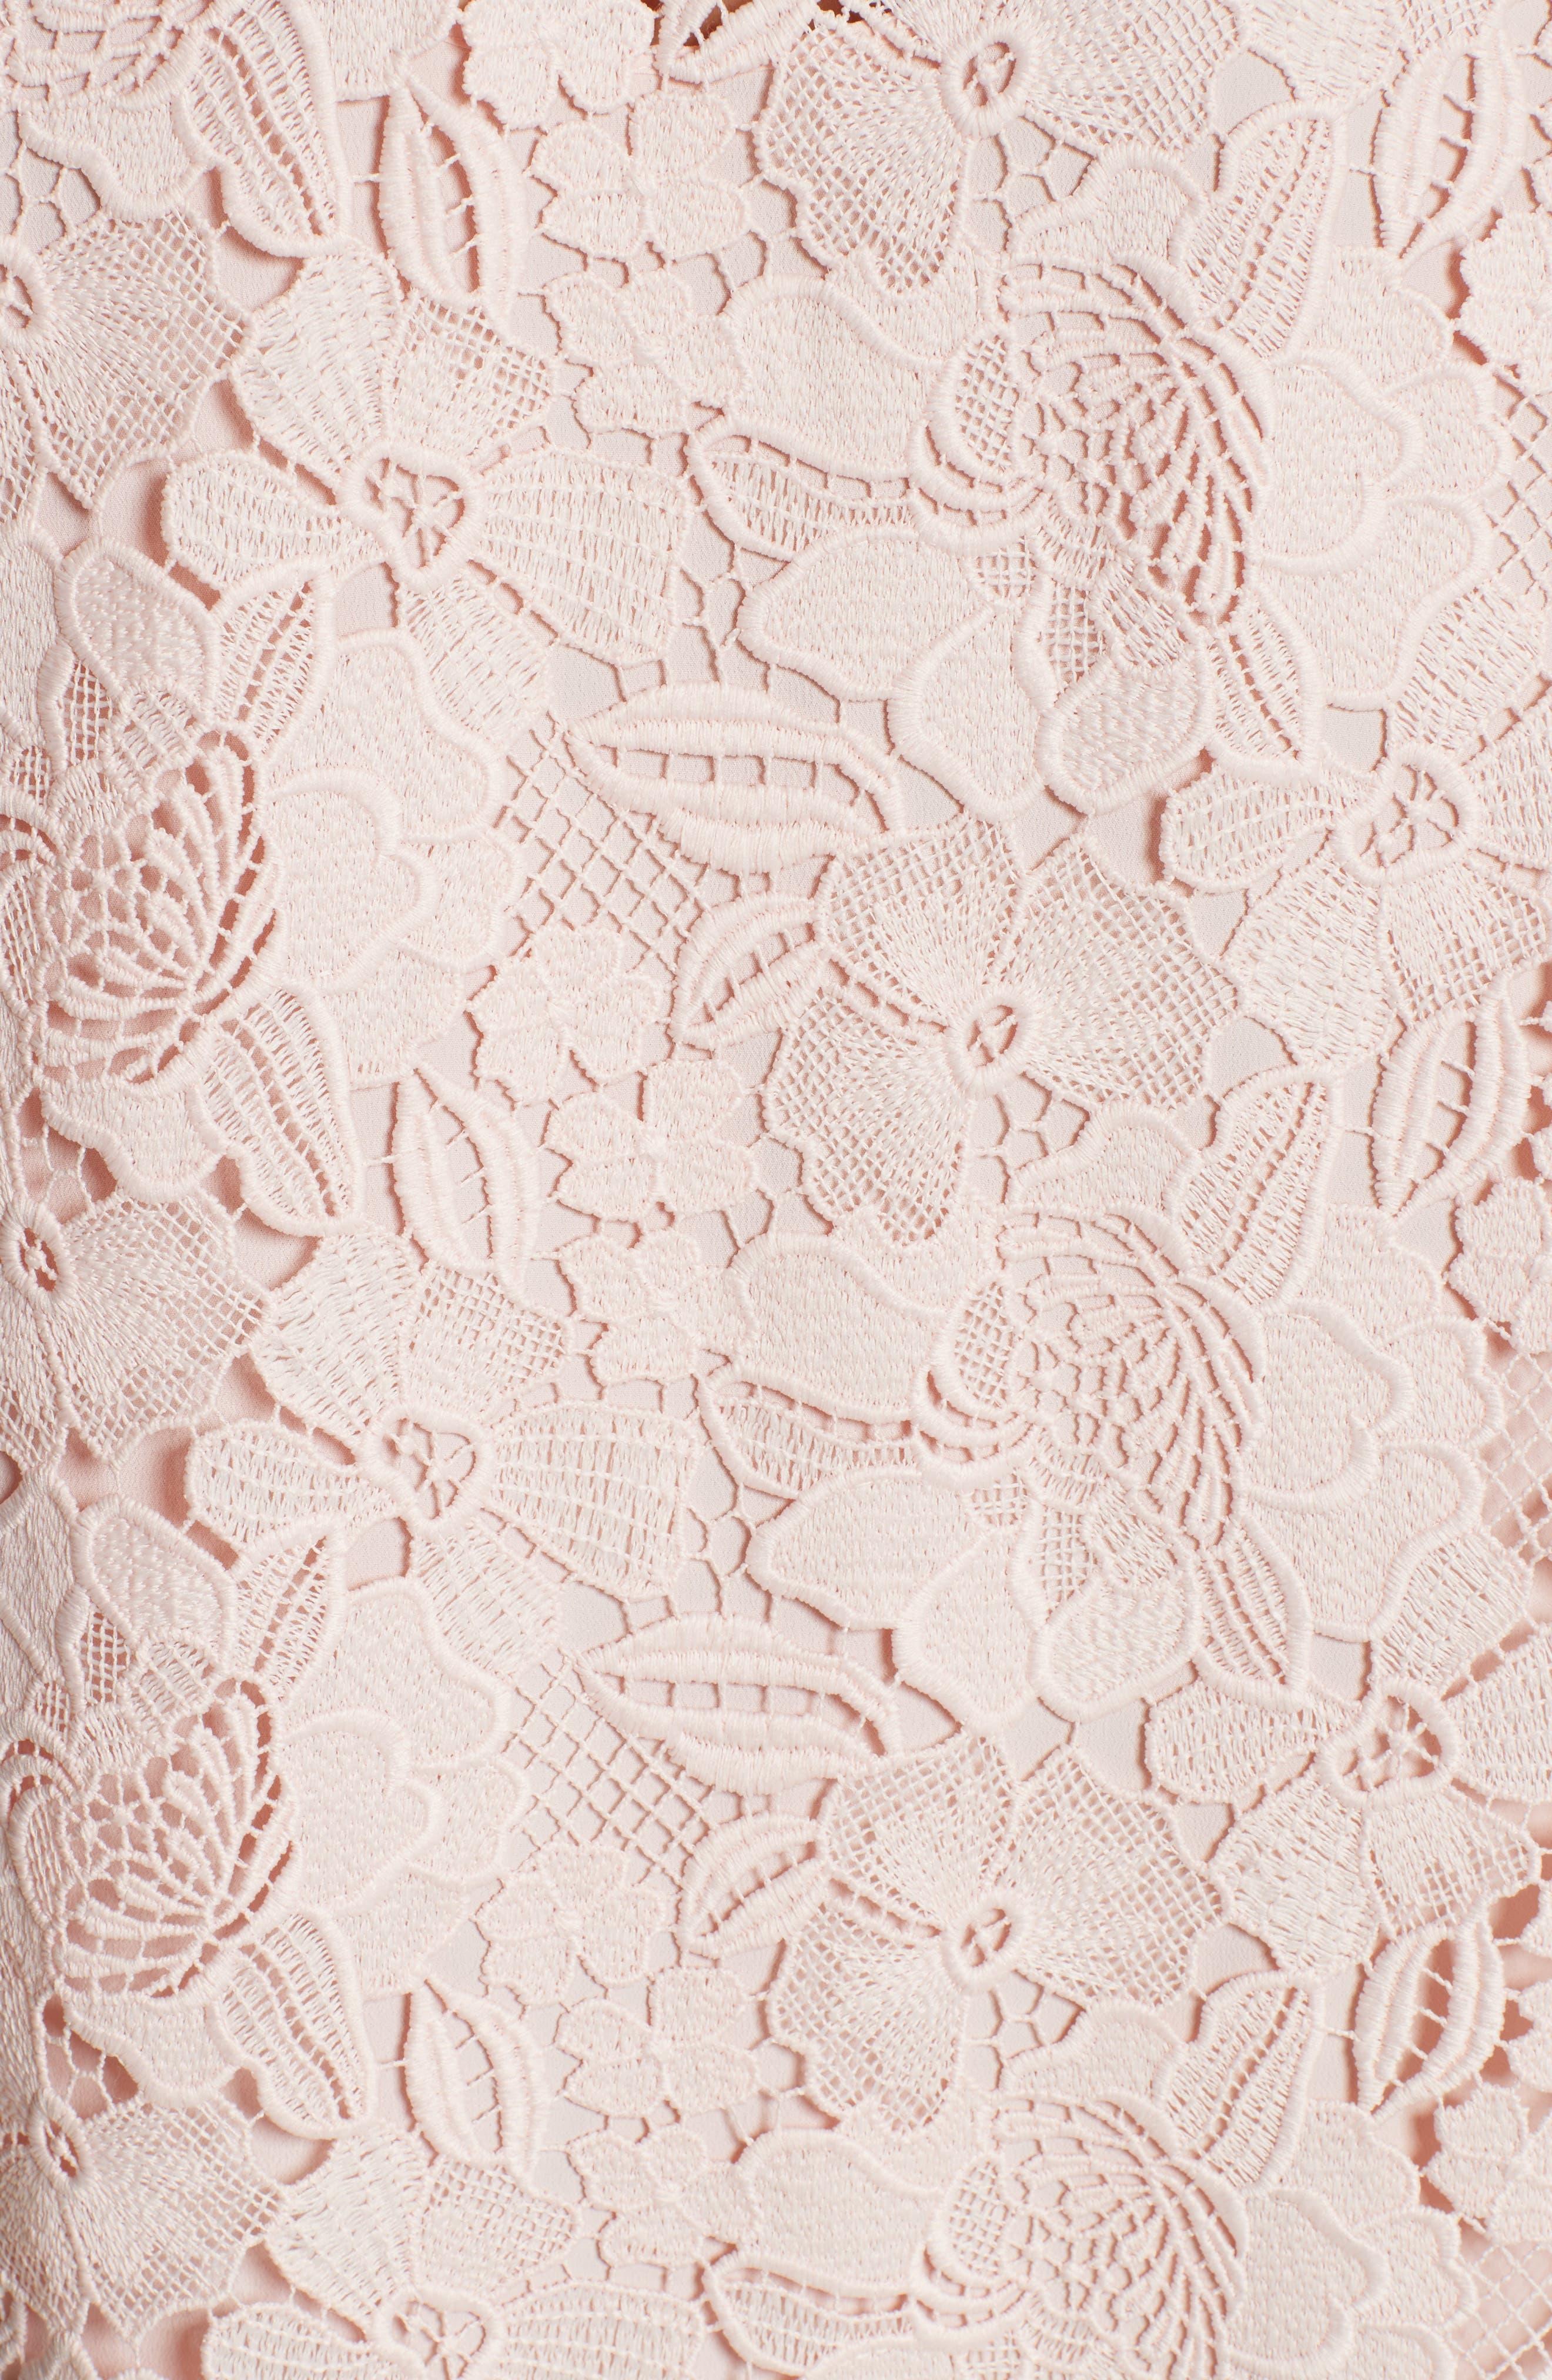 Lace & Velvet Shift Dress,                             Alternate thumbnail 5, color,                             100